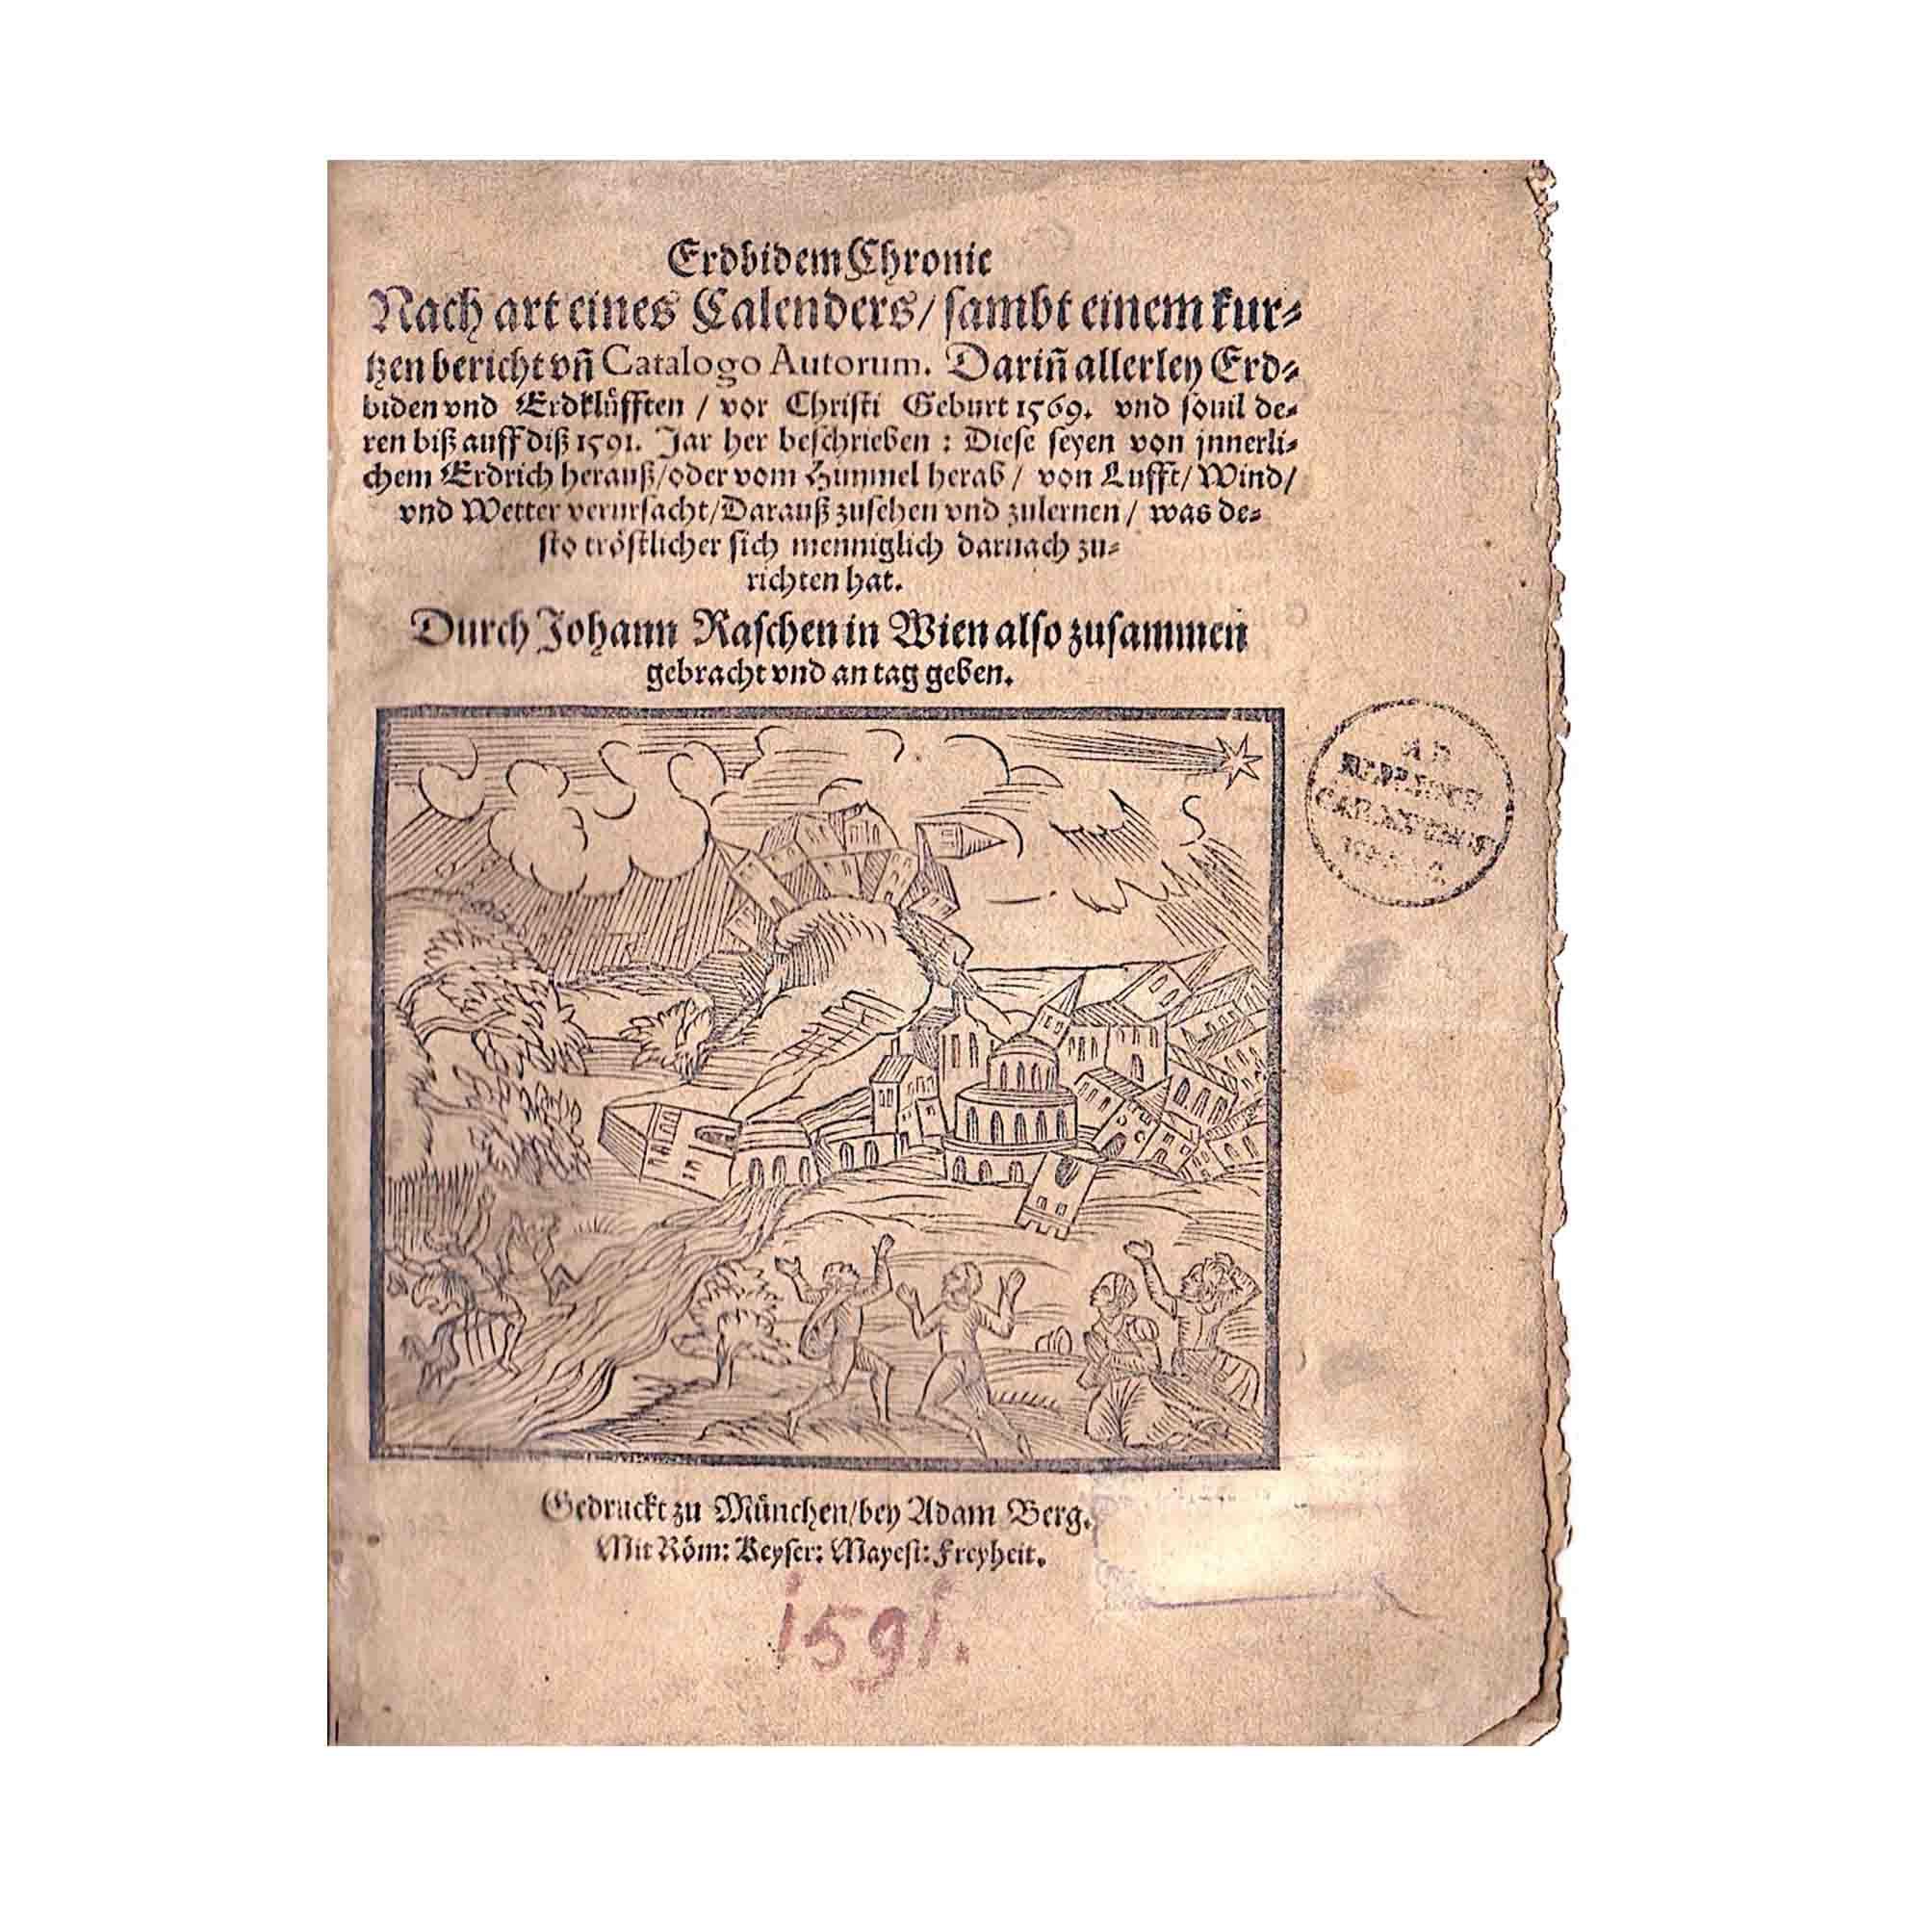 5565-Rasch-Erdbidem-Chronic-1591-Titel-A-N.jpg